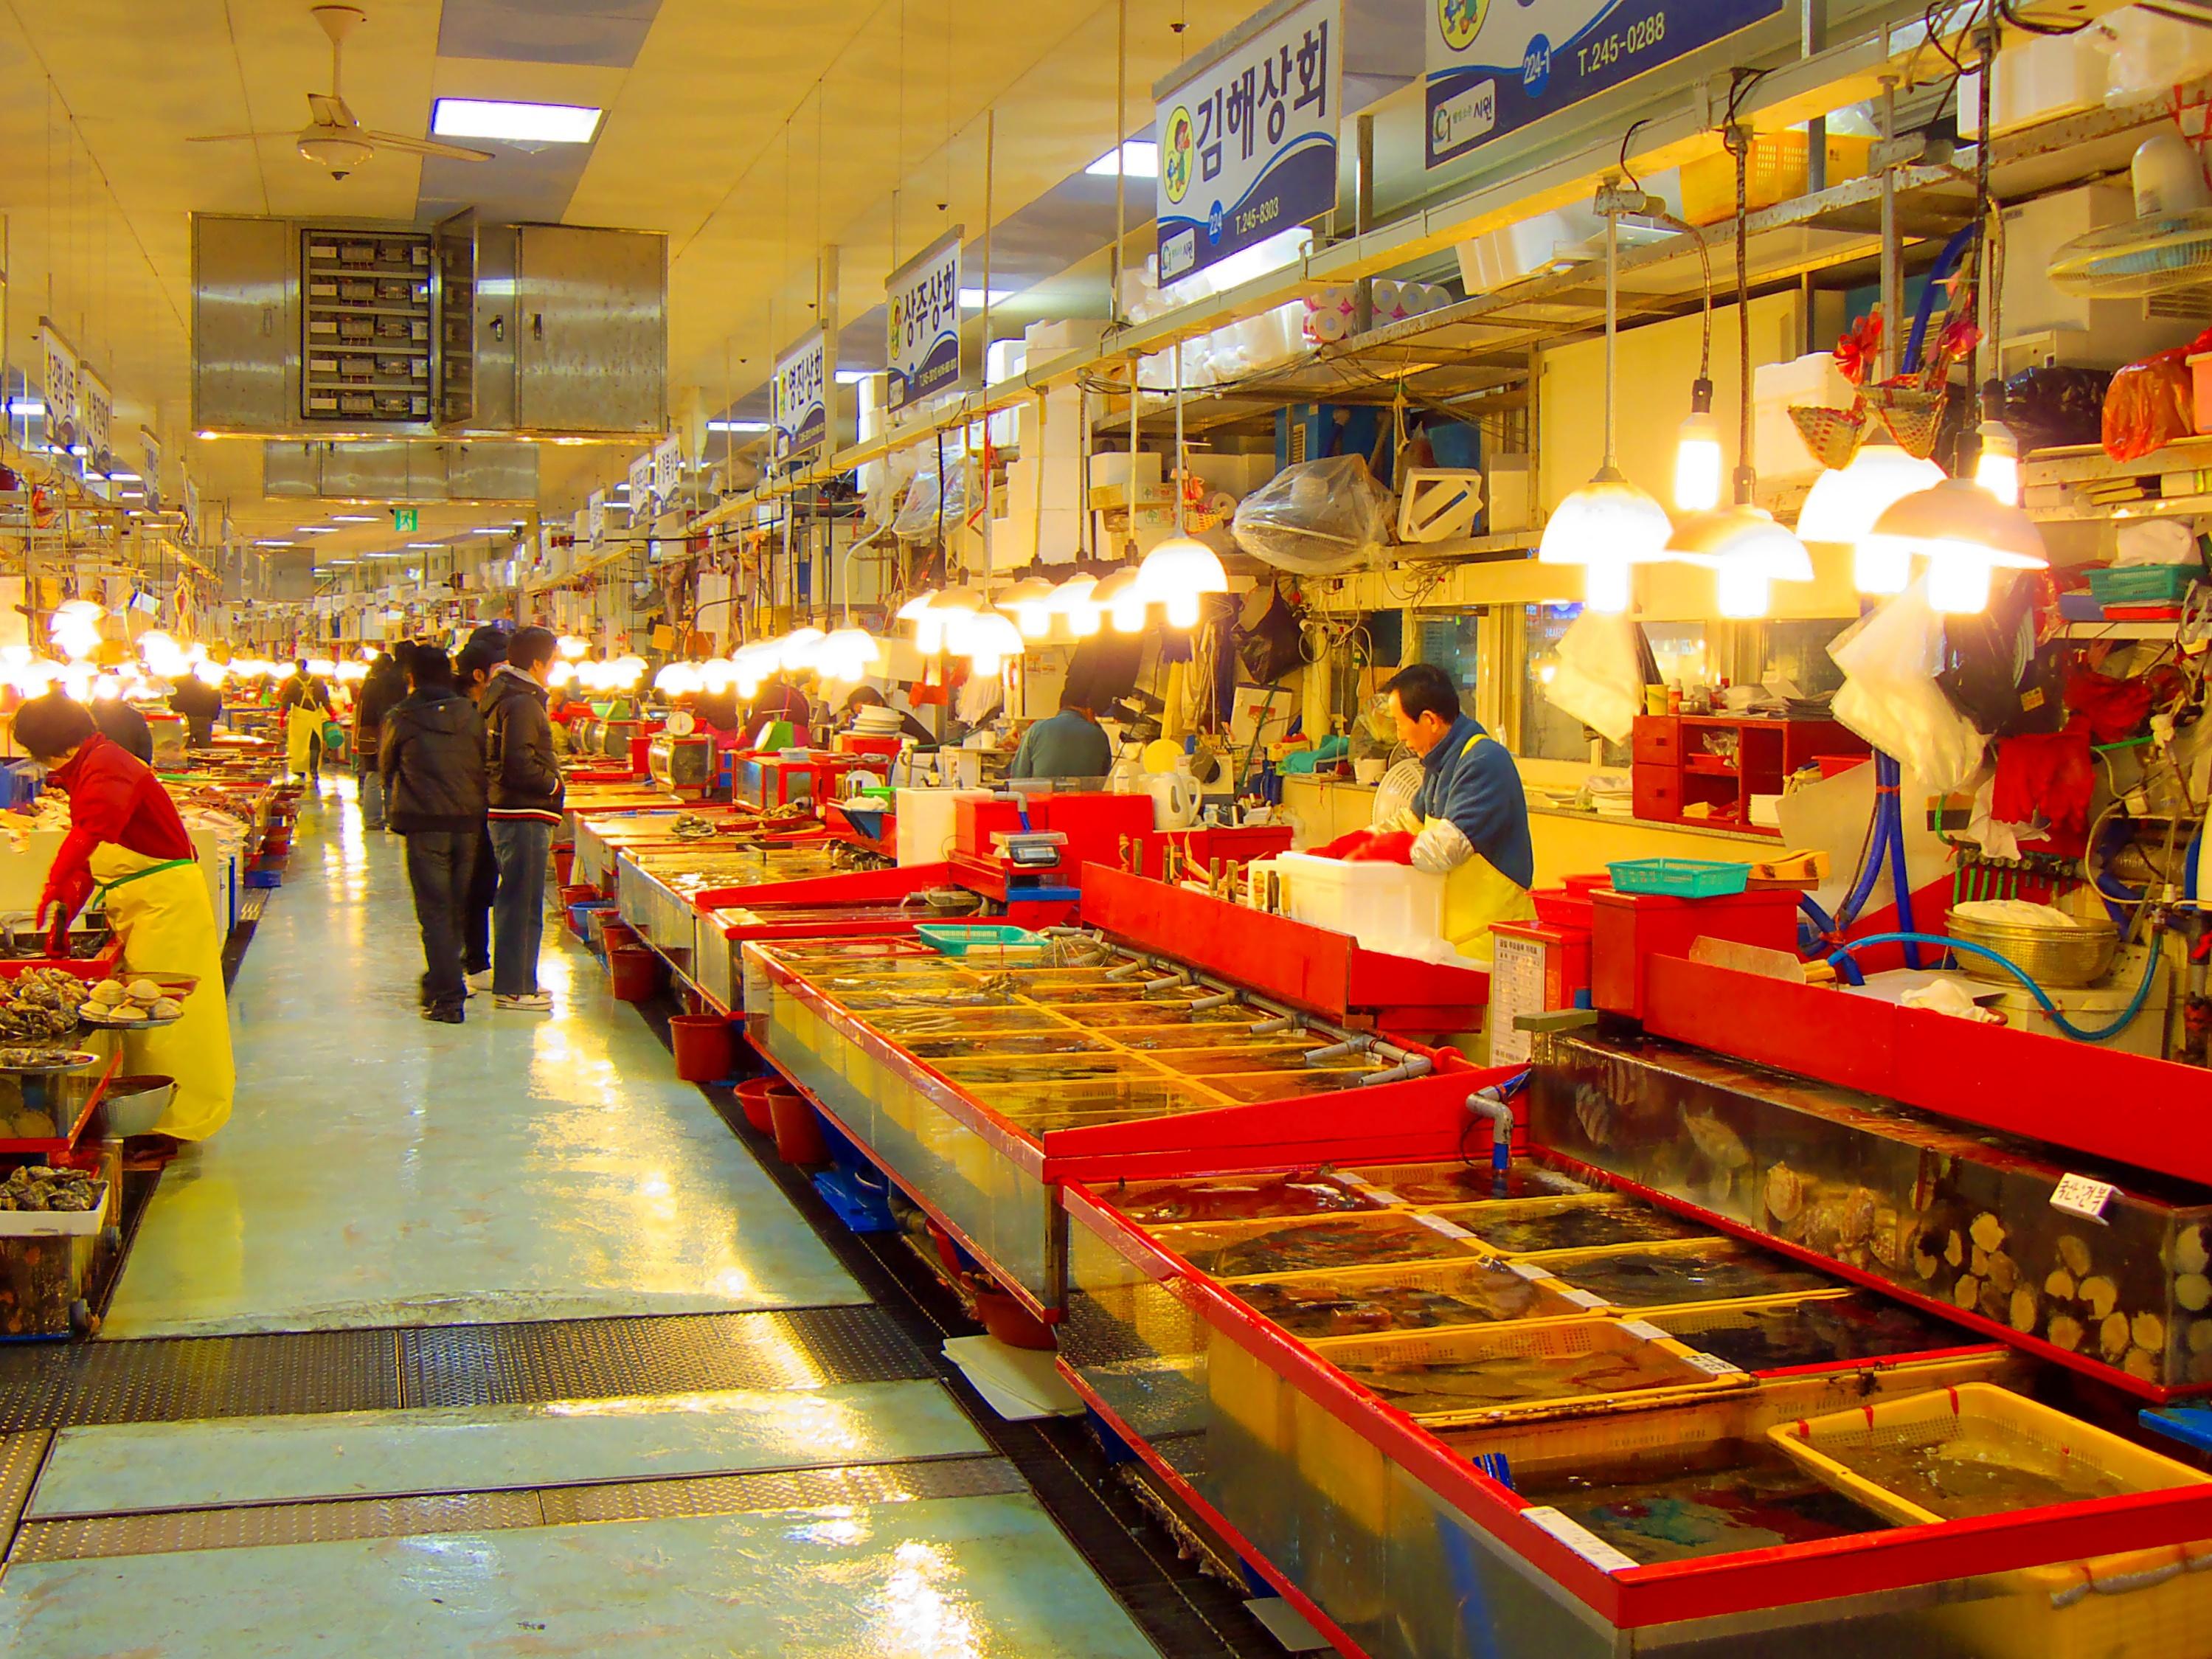 File:Jagalchi Market, Busan, South Korea.jpg - Wikimedia Commons